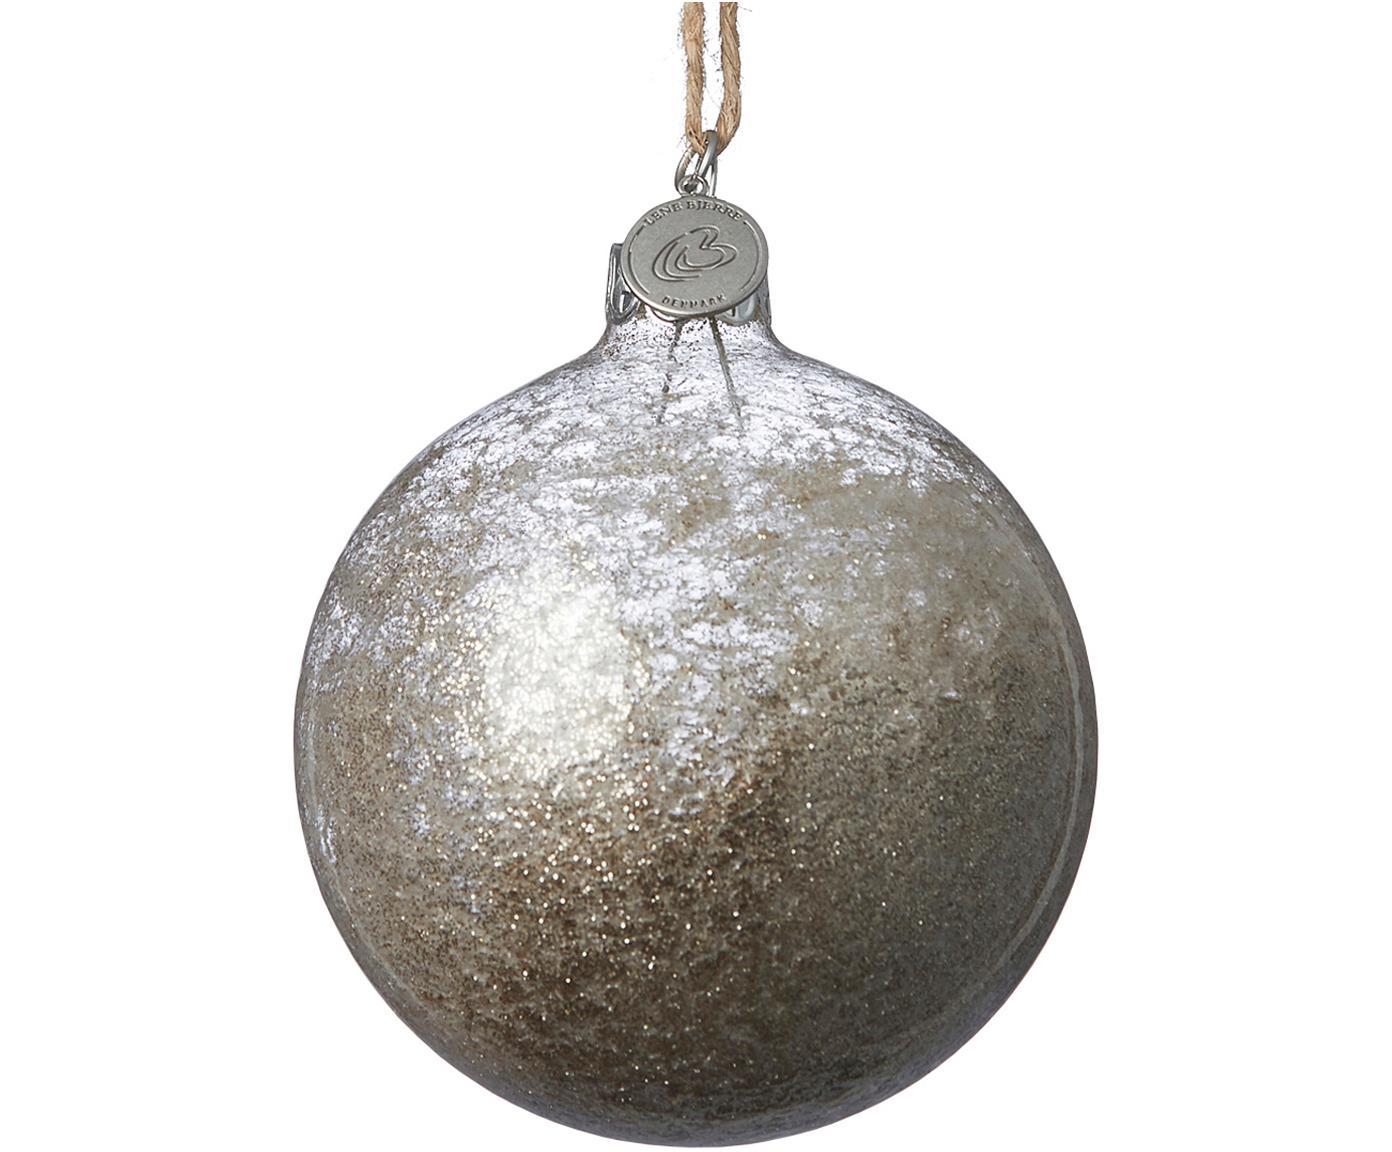 Palla di Natale Velma Ø 8 cm, 2 pz, Dorato trasparente, Ø 8 cm